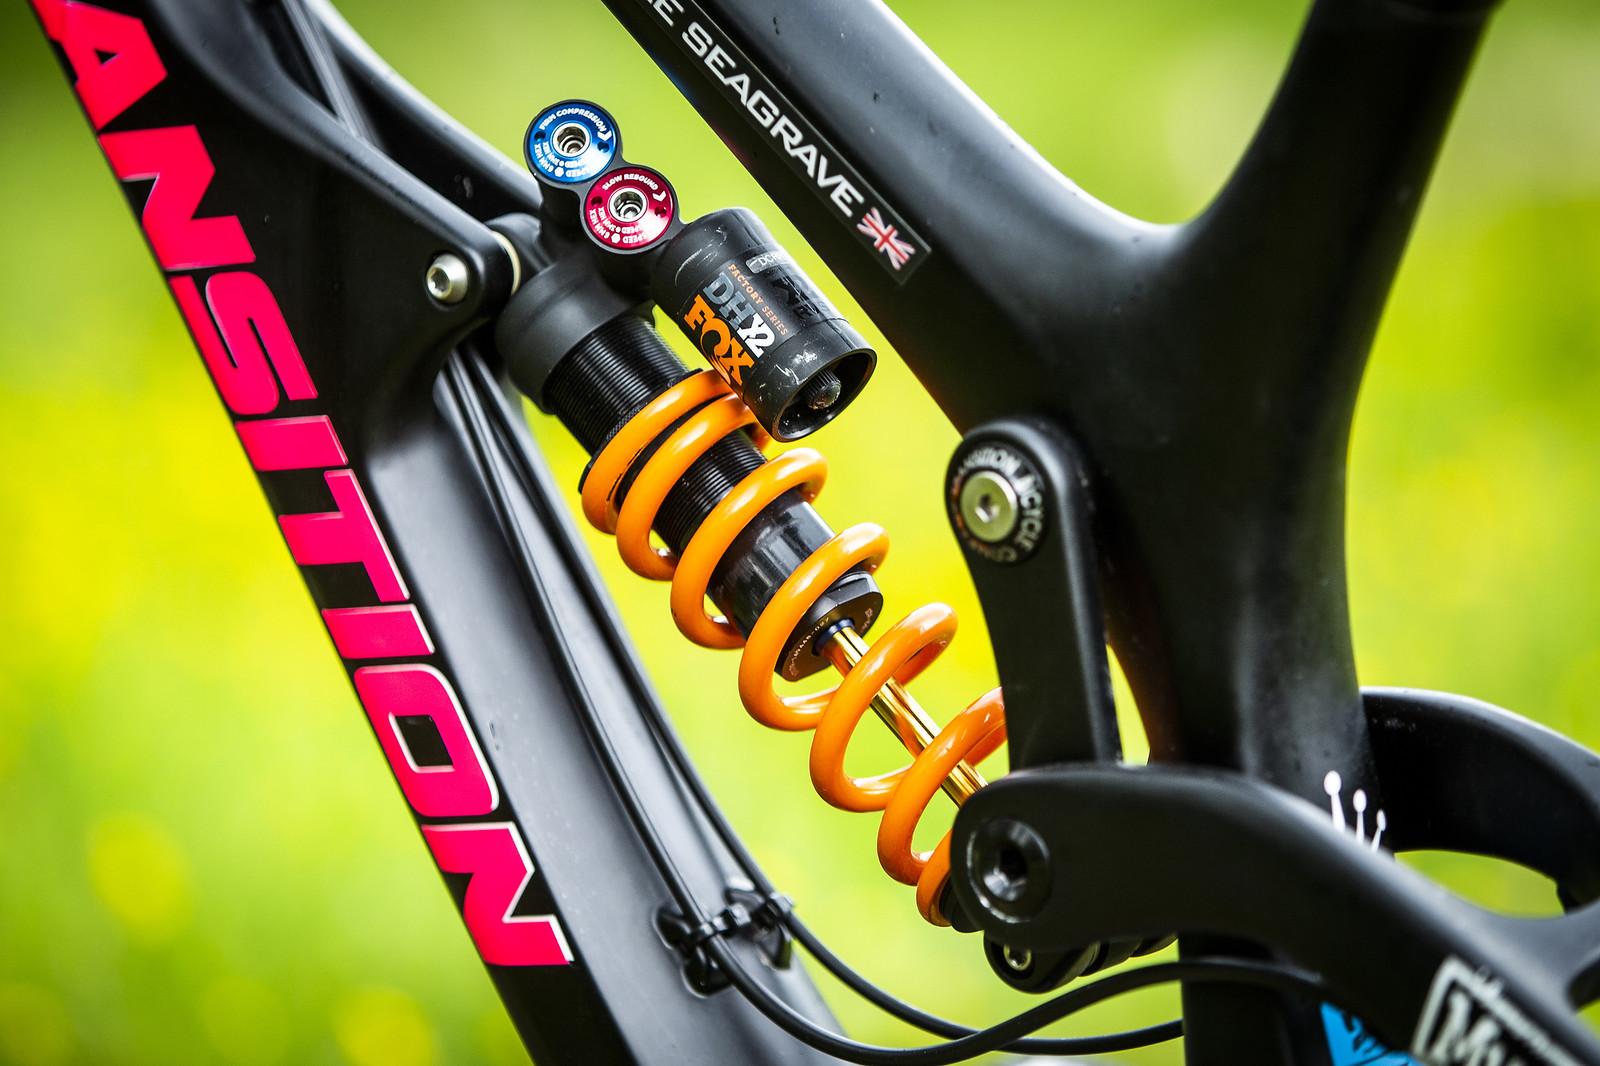 FOX DHX2 Coil Shock - WINNING BIKE - Tahnee Seagrave's Transition TR11 - Mountain Biking Pictures - Vital MTB